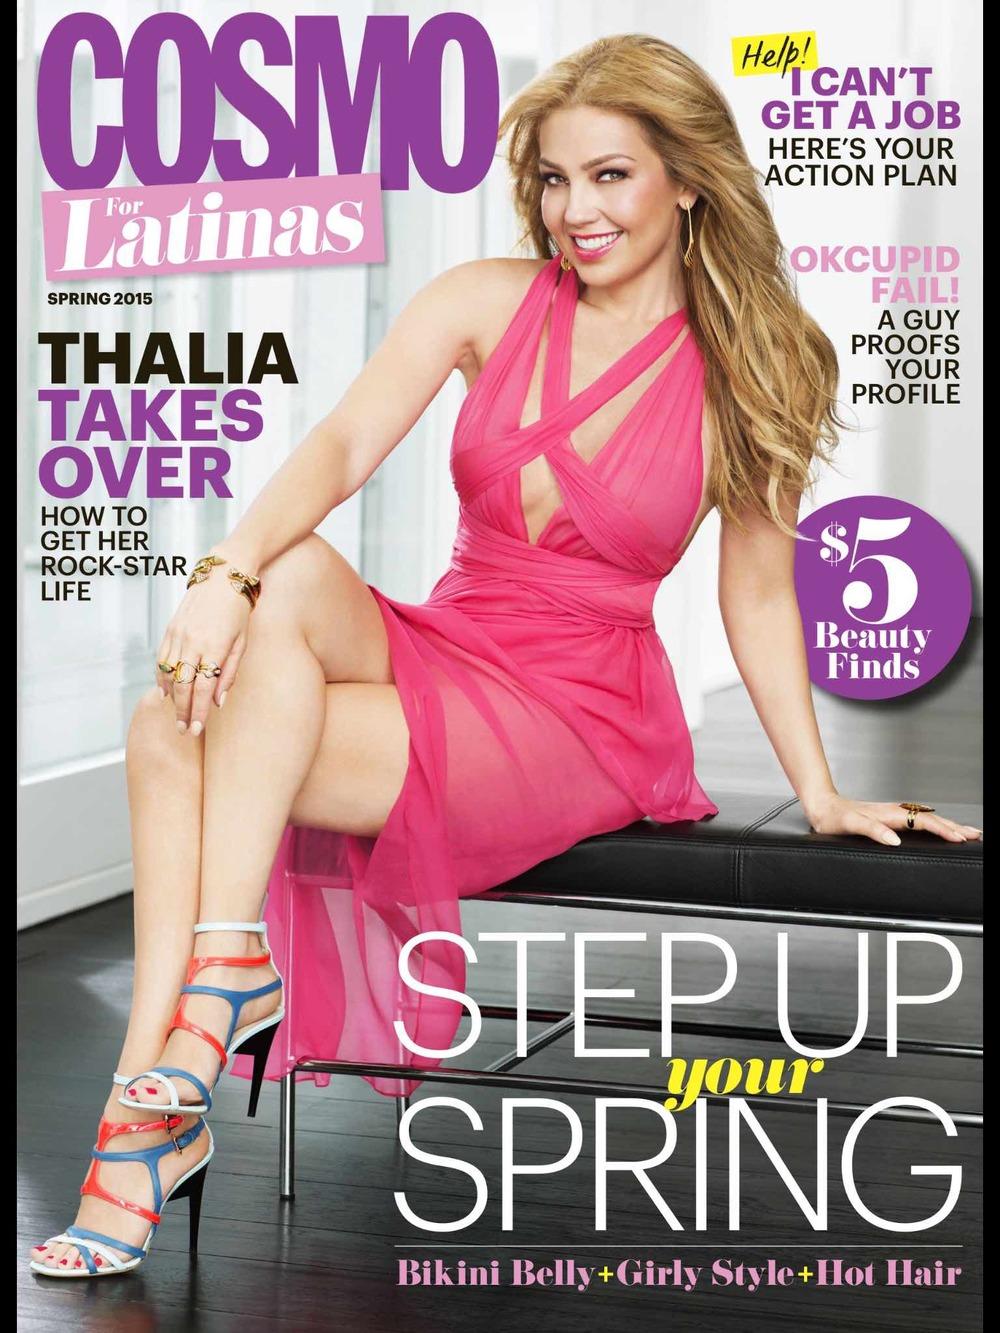 Cosmo Latina Cover-2.jpg